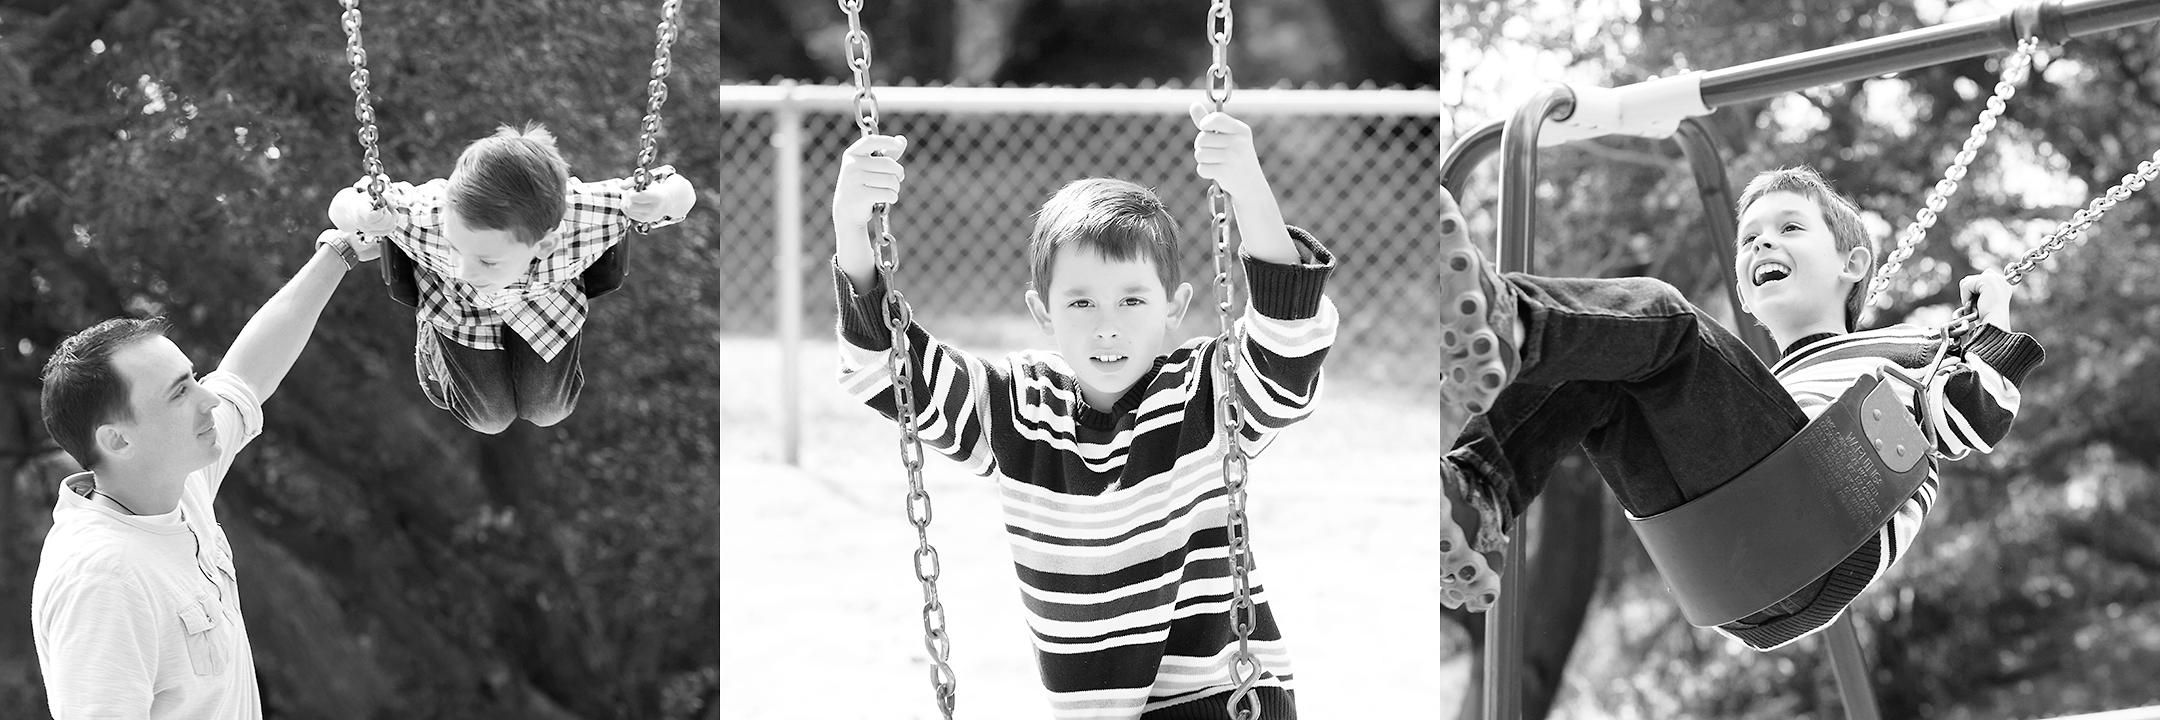 lifestyle-family-portraits-at-the-park-capture-it-sports-12